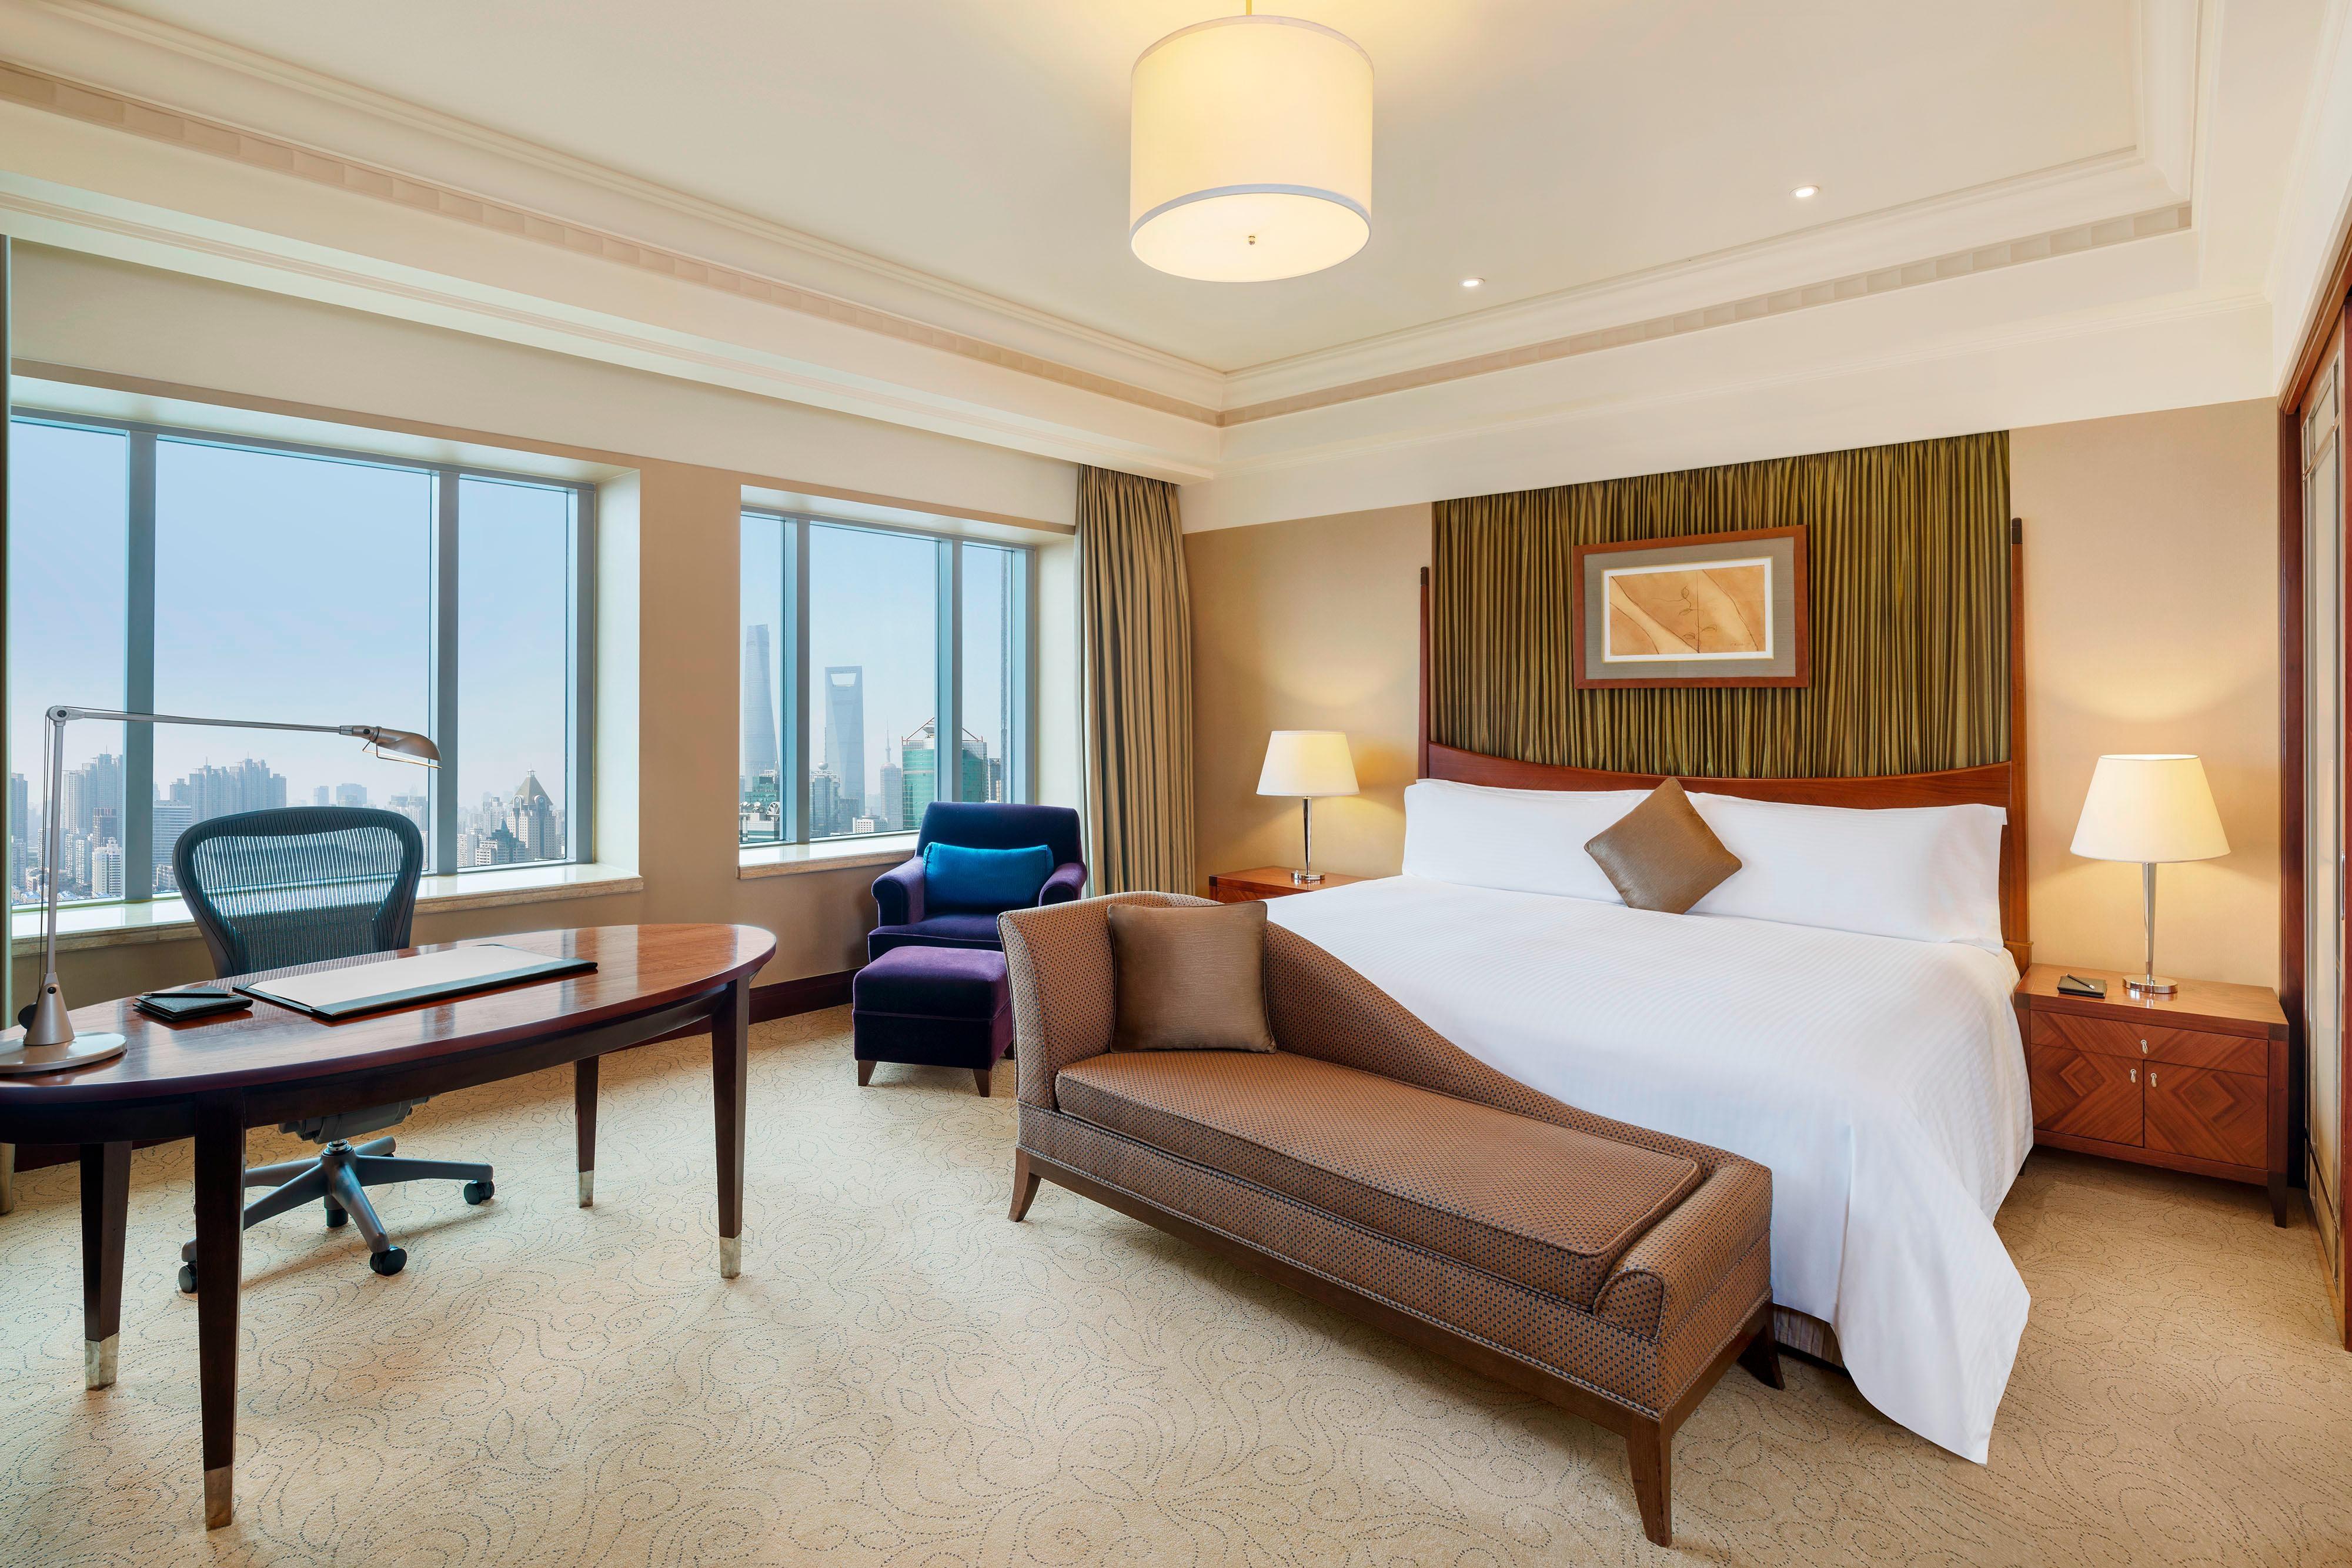 Chambre Executive avec lit king size